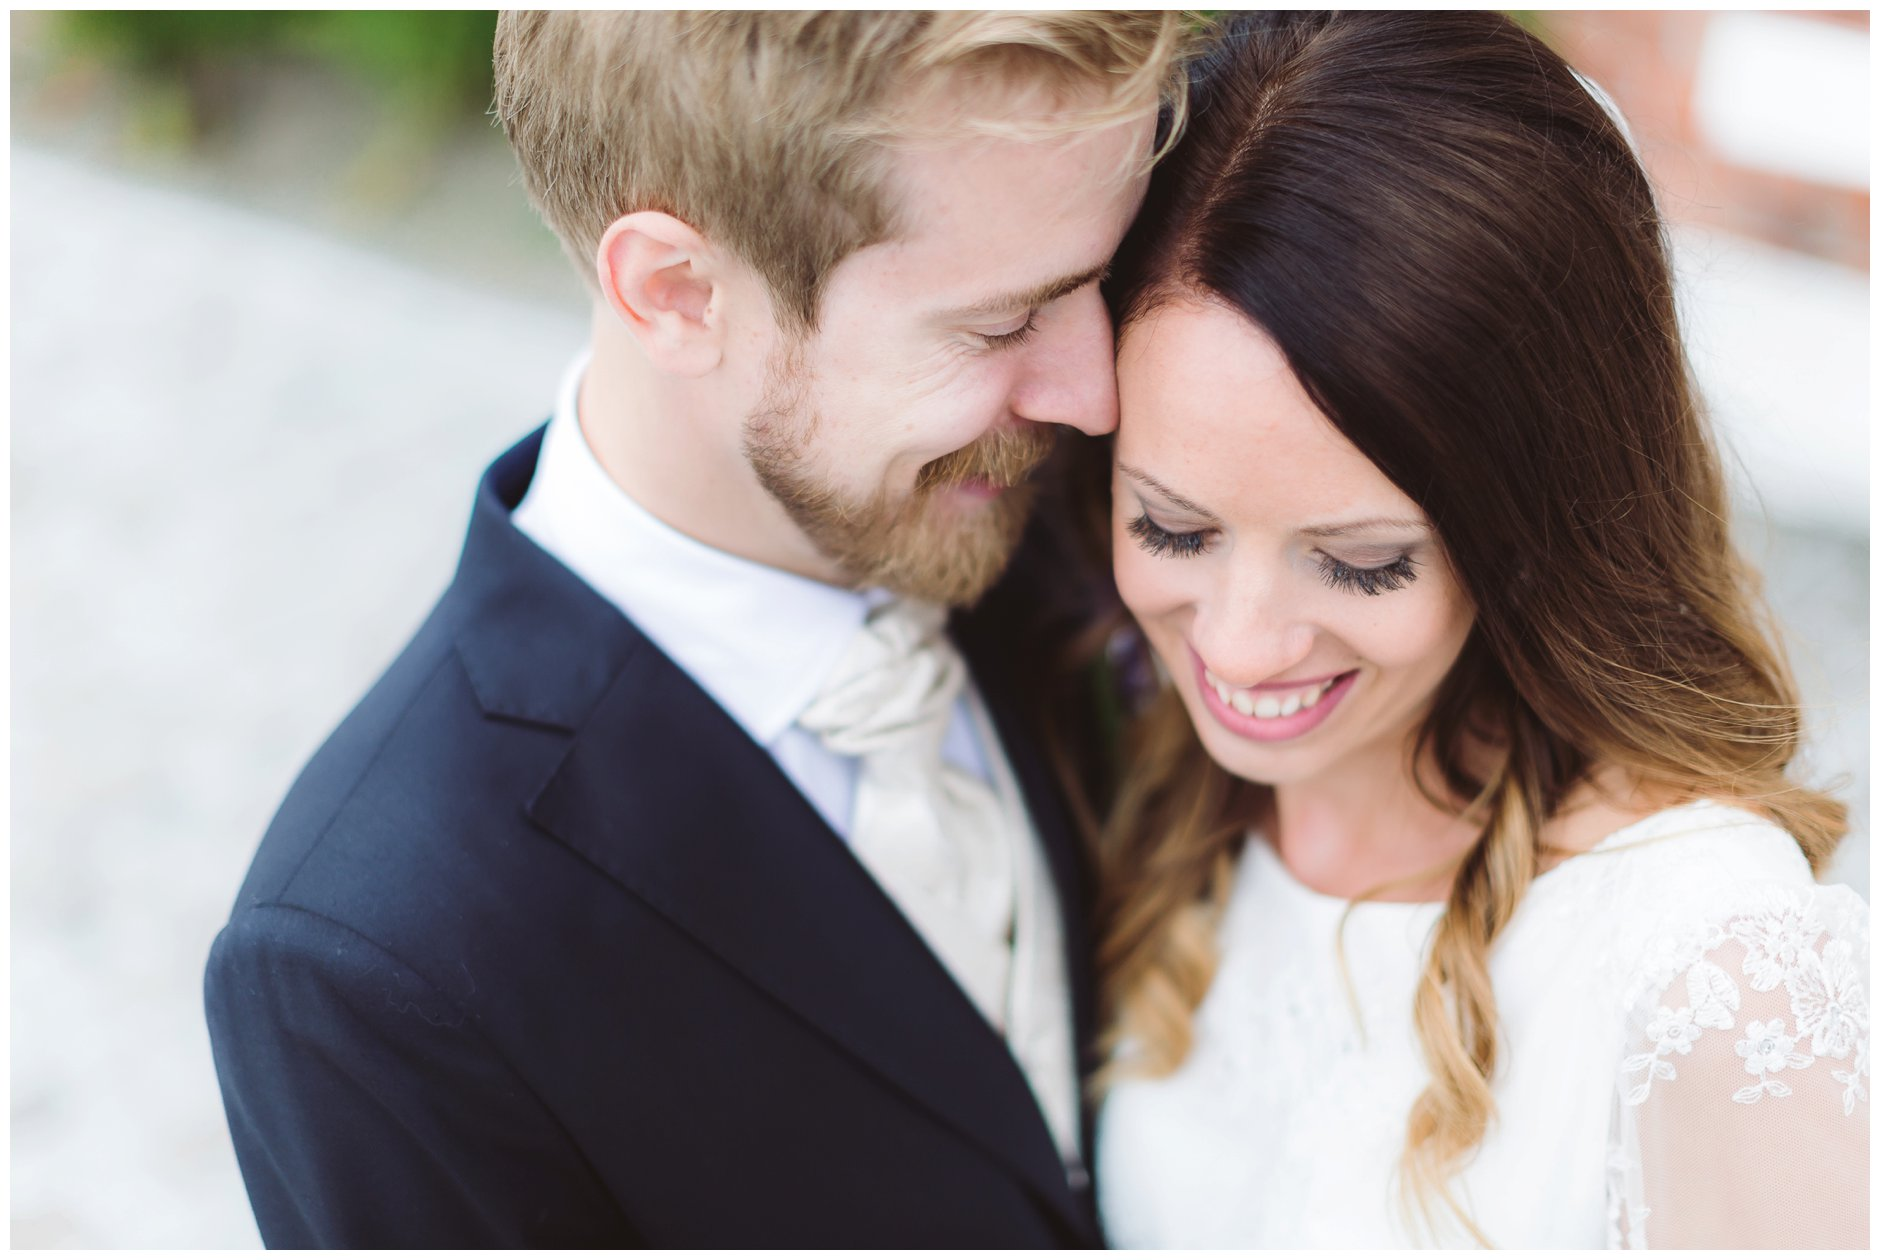 Bryllupsfotografering i Drøbak og Ås